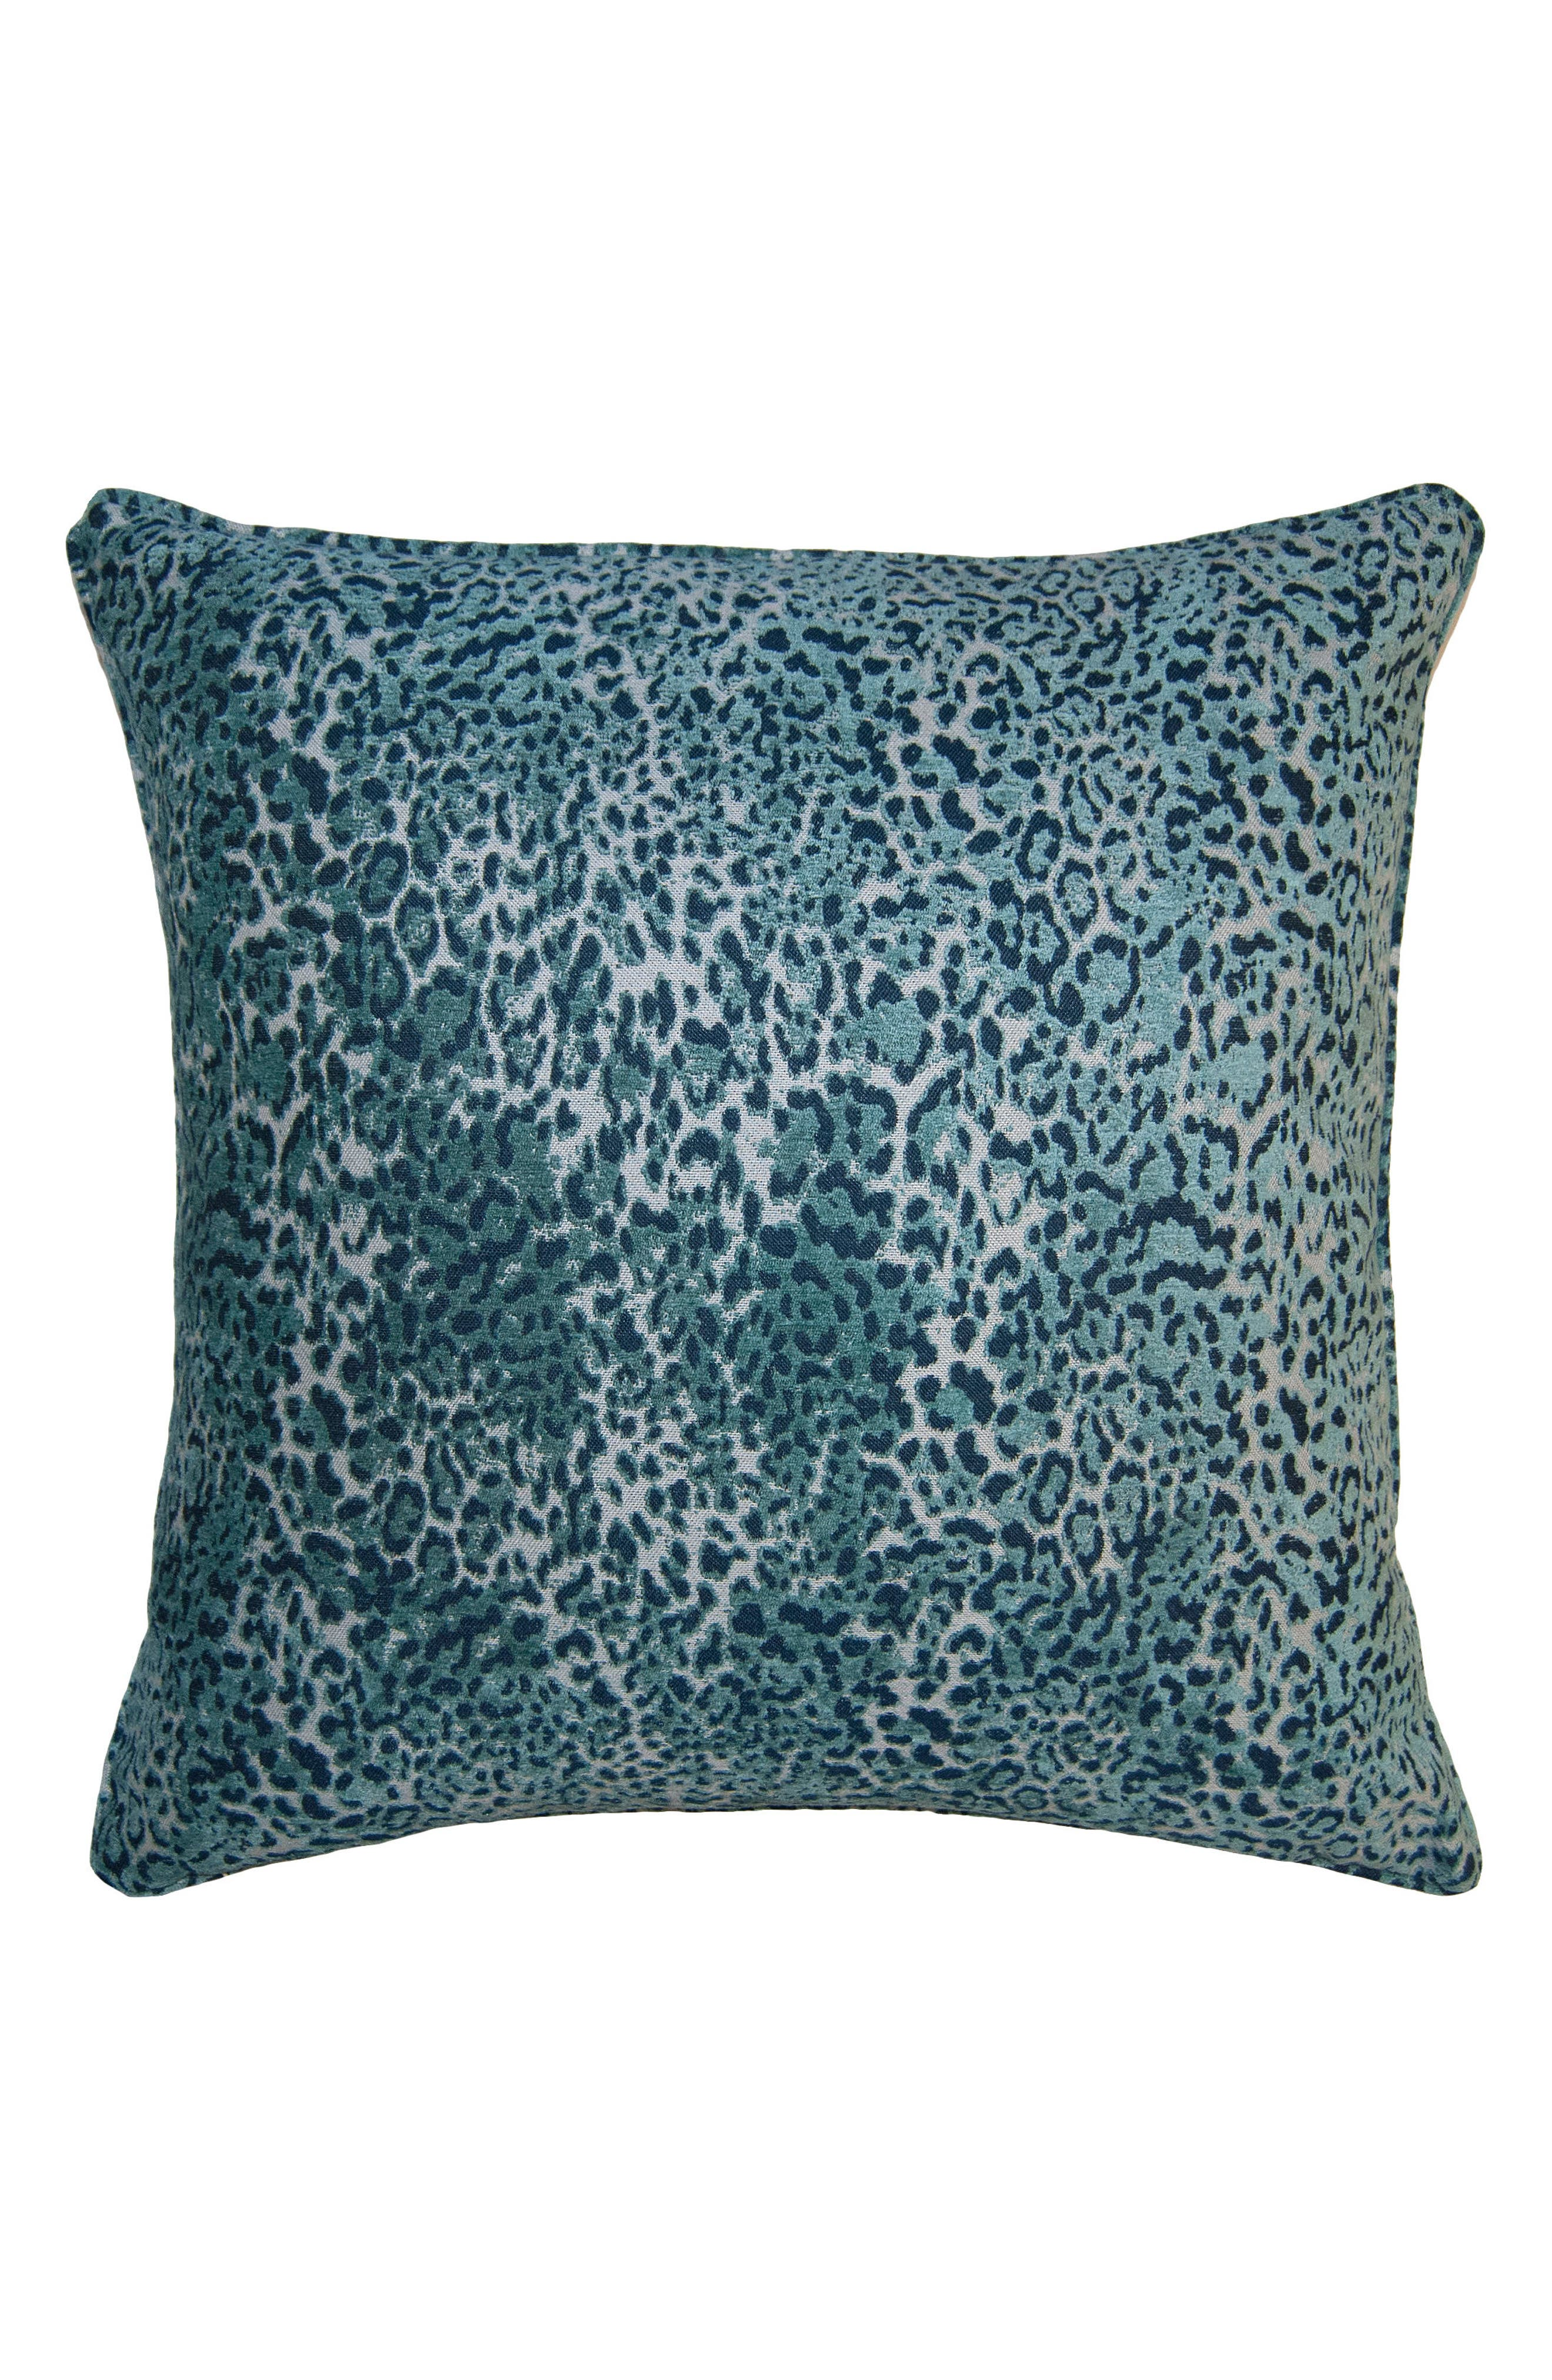 Sky Safari Accent Pillow,                         Main,                         color, Blue